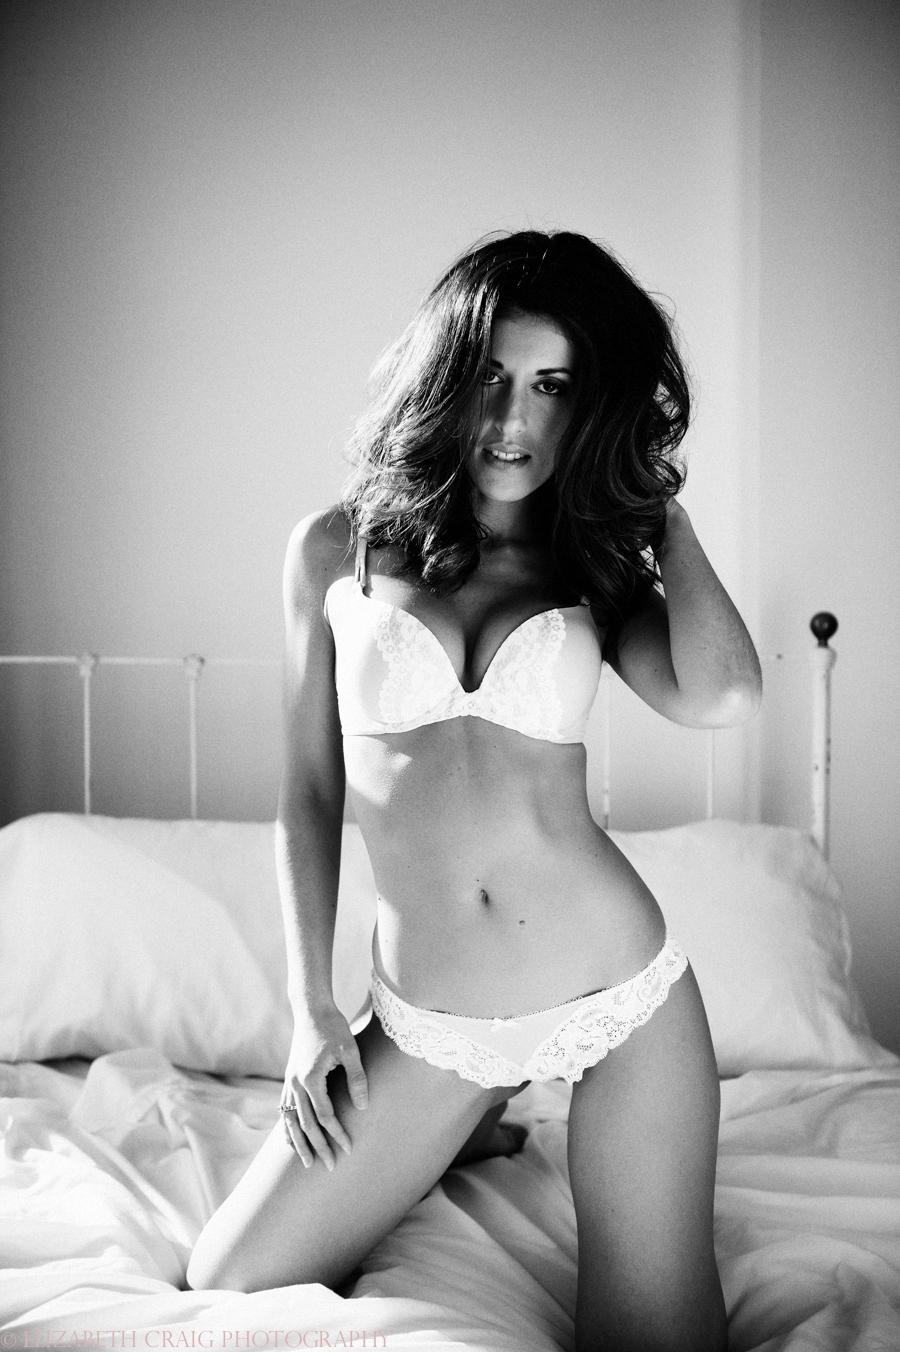 Sensual Boudoir Photos Elizabeth Craig Photography-0001